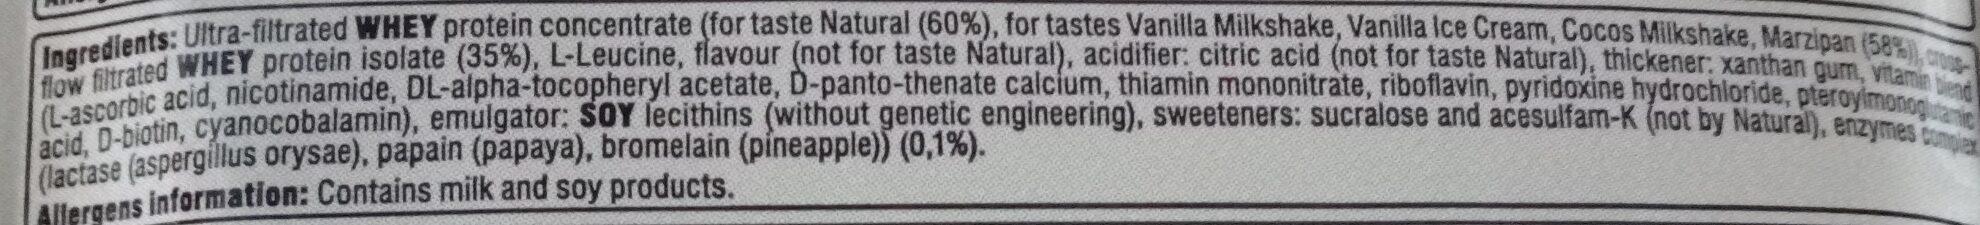 Whey saveur vanille crème glacée - Ingredients - fr